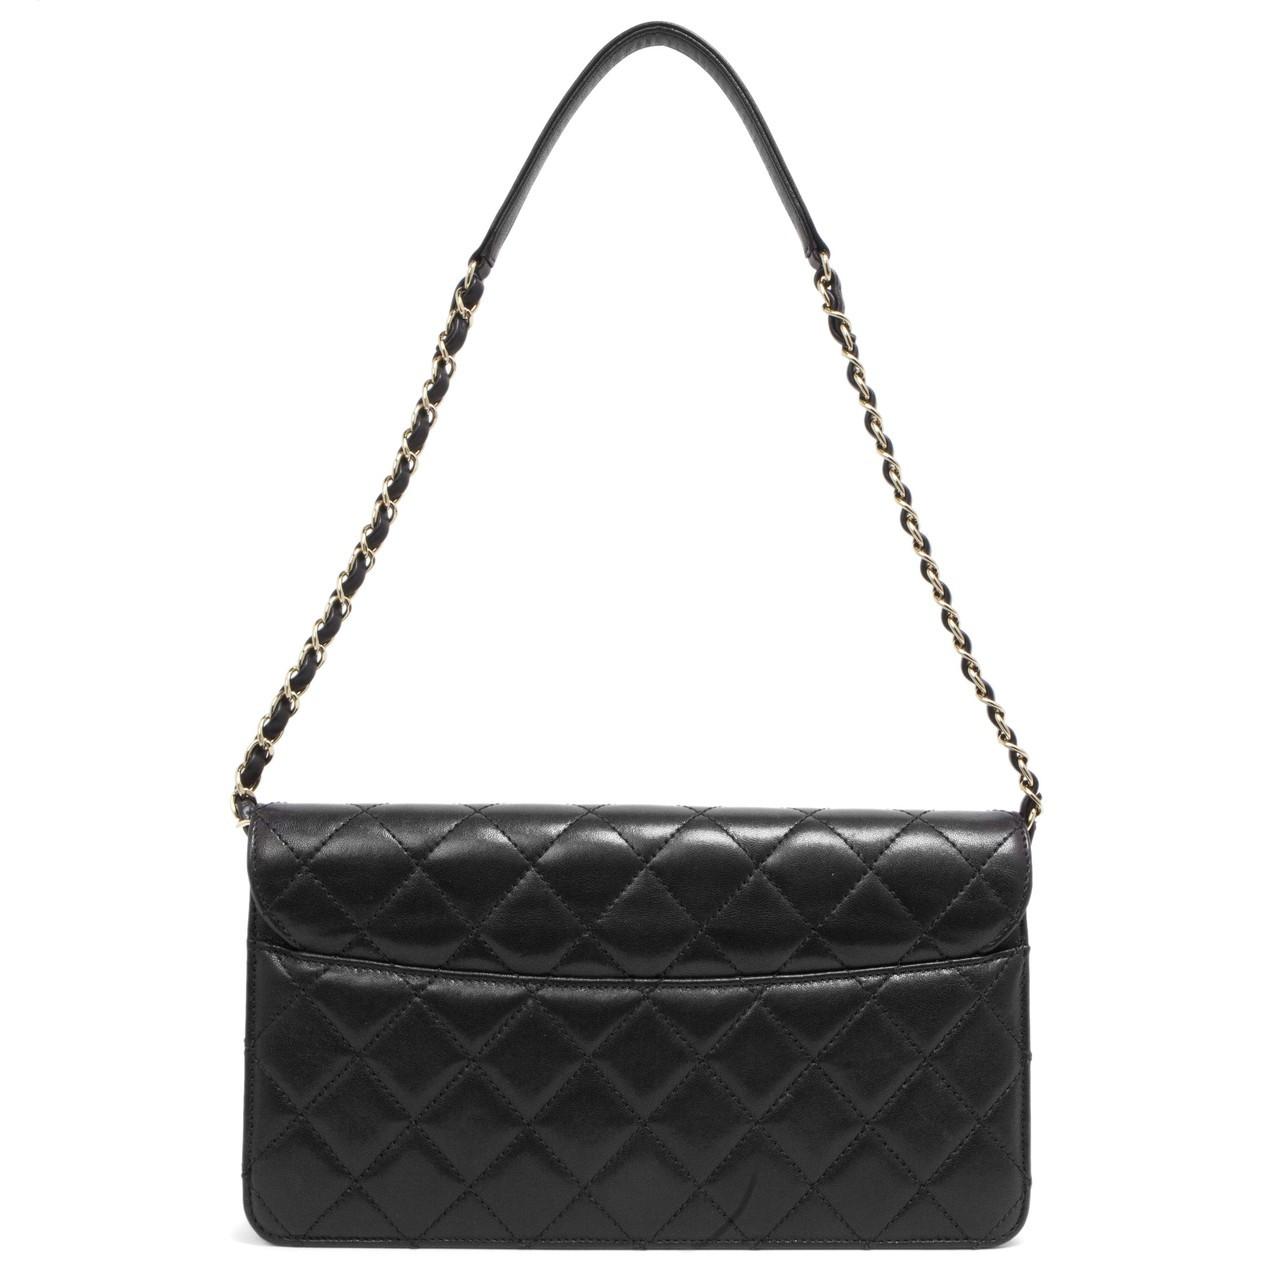 05b9aef7105a Chanel Black Sheepskin Beauty Lock Flap Bag - modaselle